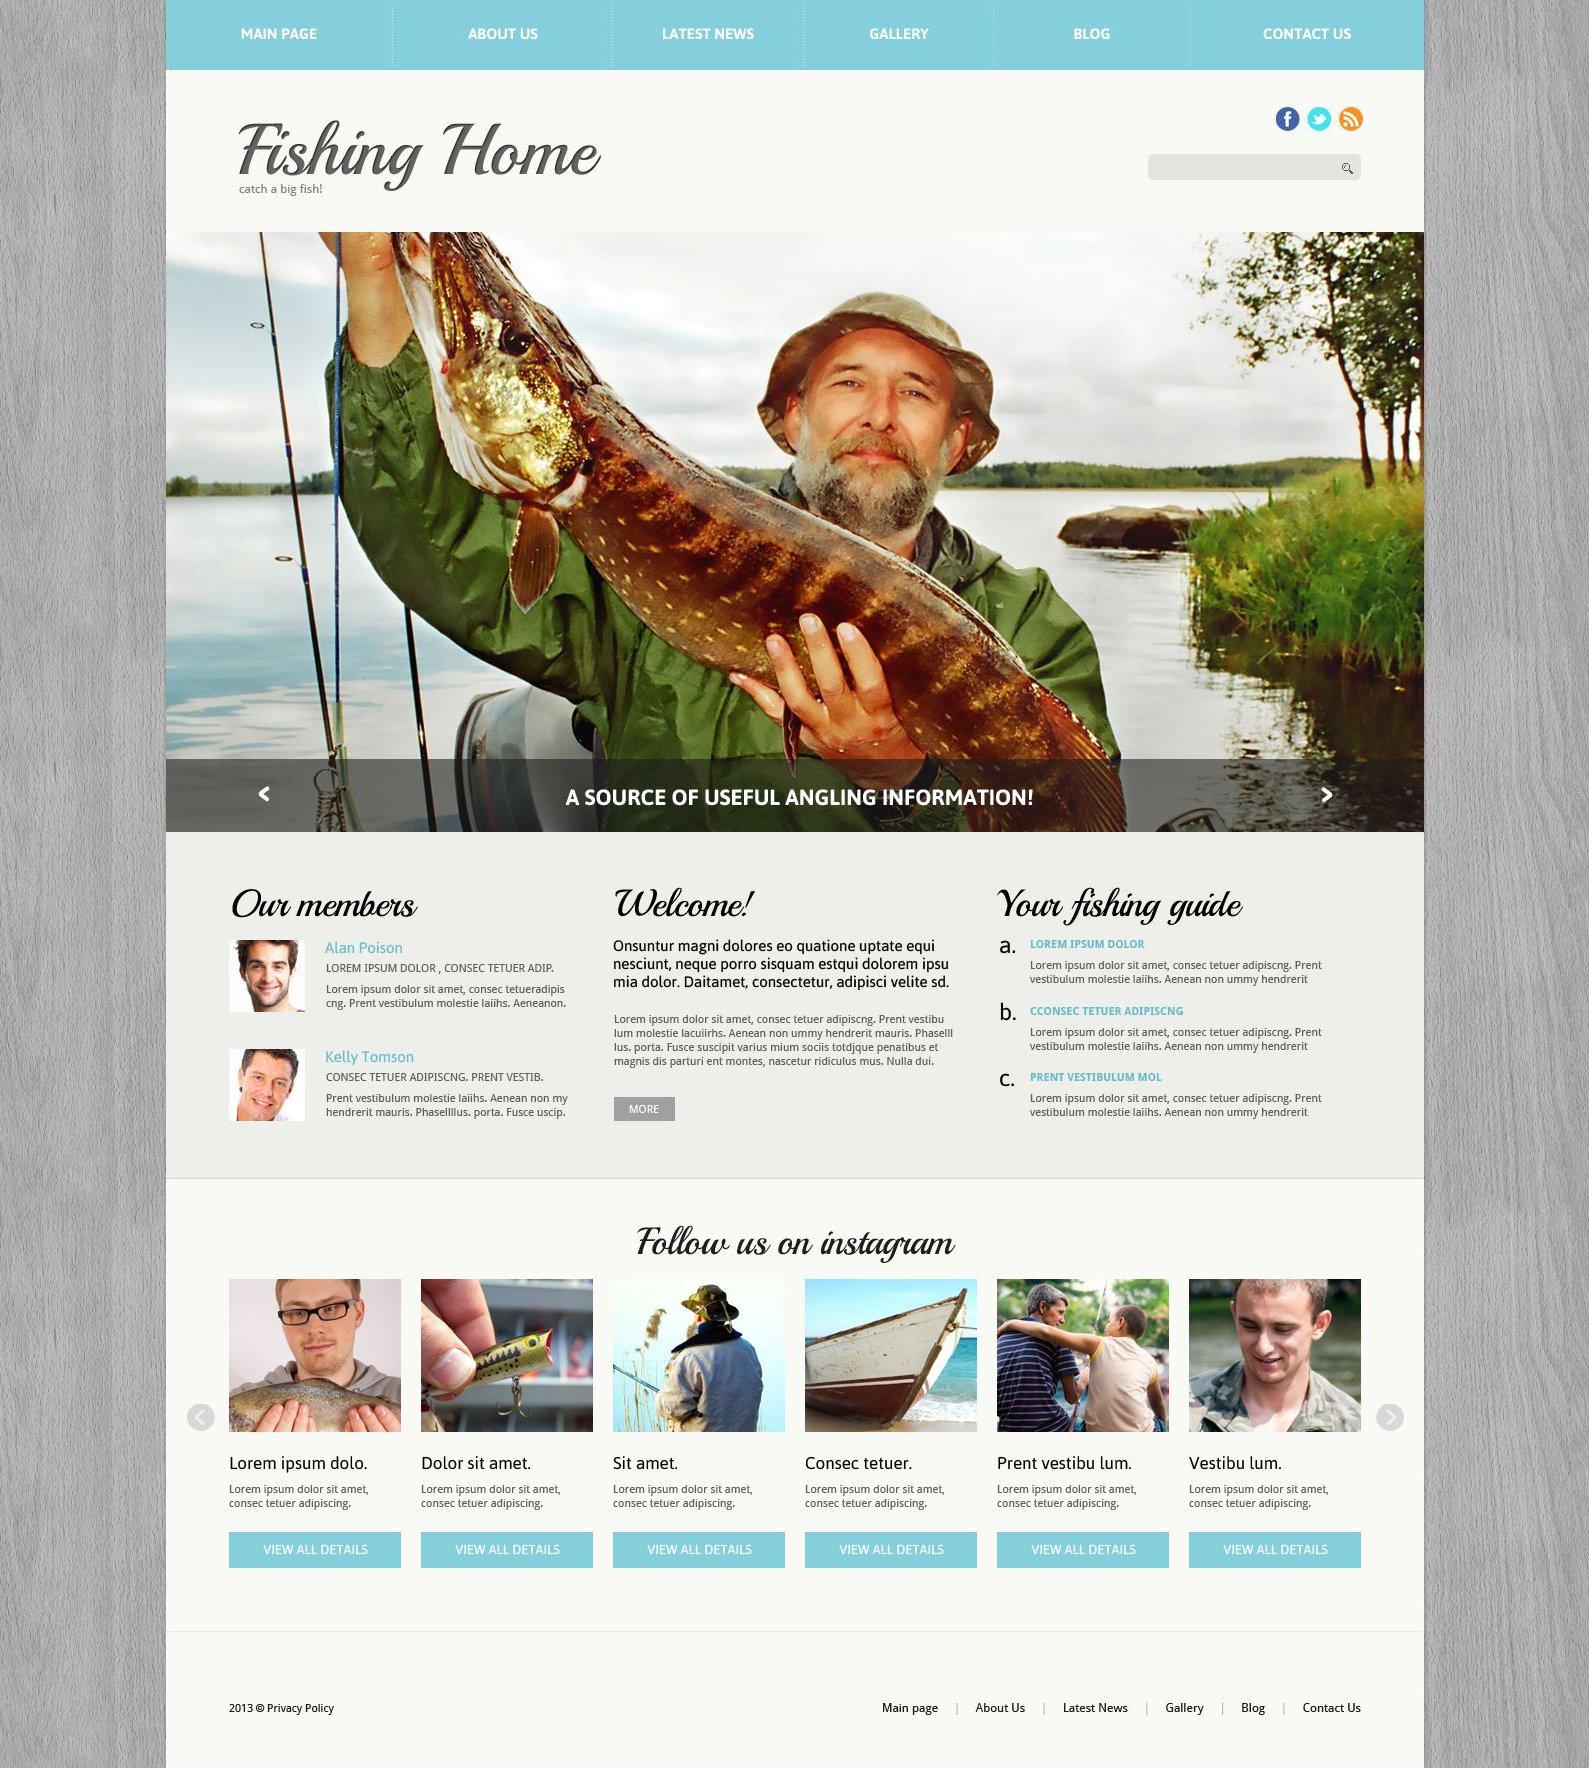 Plantilla Joomla Responsive para Sitio de Pesca #51764 - captura de pantalla